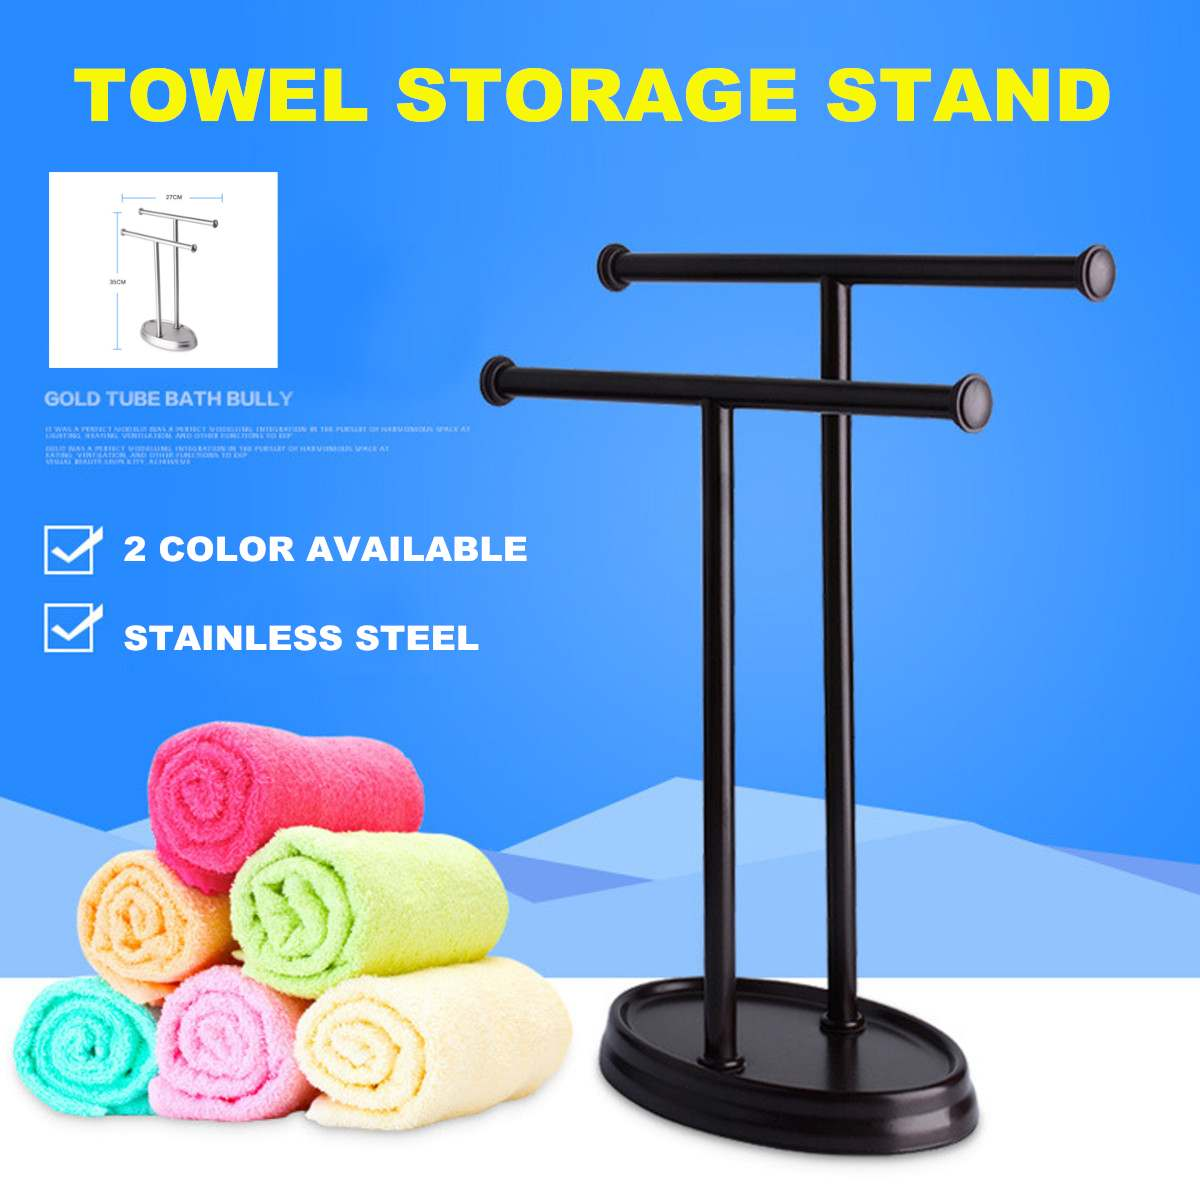 Towel Holder 3 5 Tier Bar Freestanding Bathroom Drying Rack Hanger Storage Unit